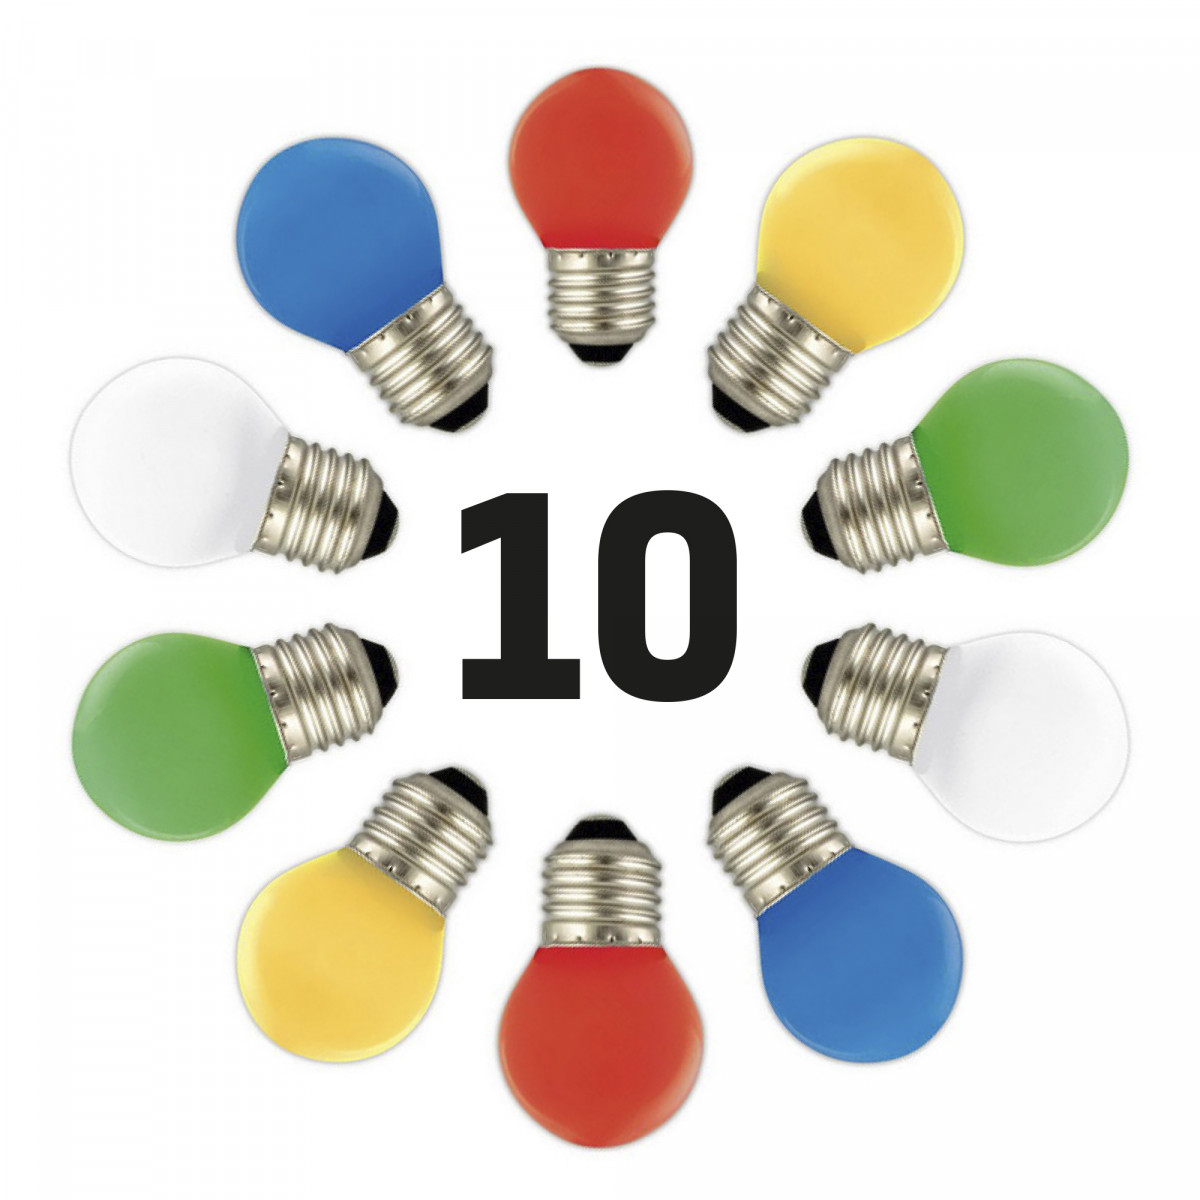 LED Feestverlichting 10 x 1 Watt - 10 kleuren